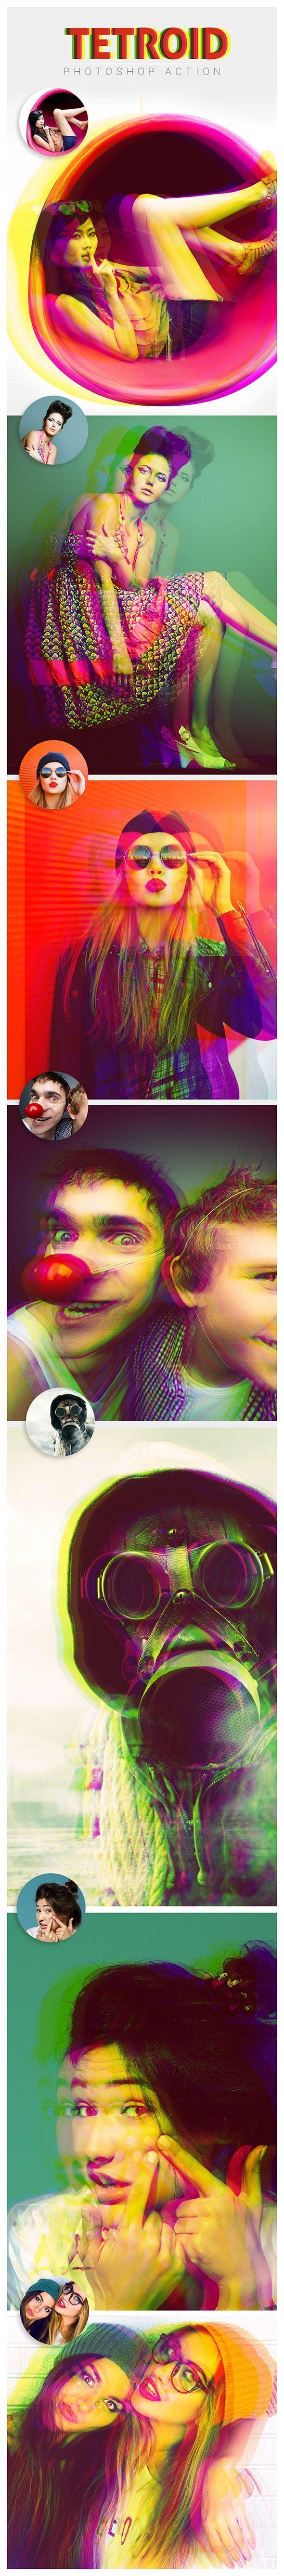 Tetroid - Photoshop Action #photoeffect. Photoshop tips. Nordic360.